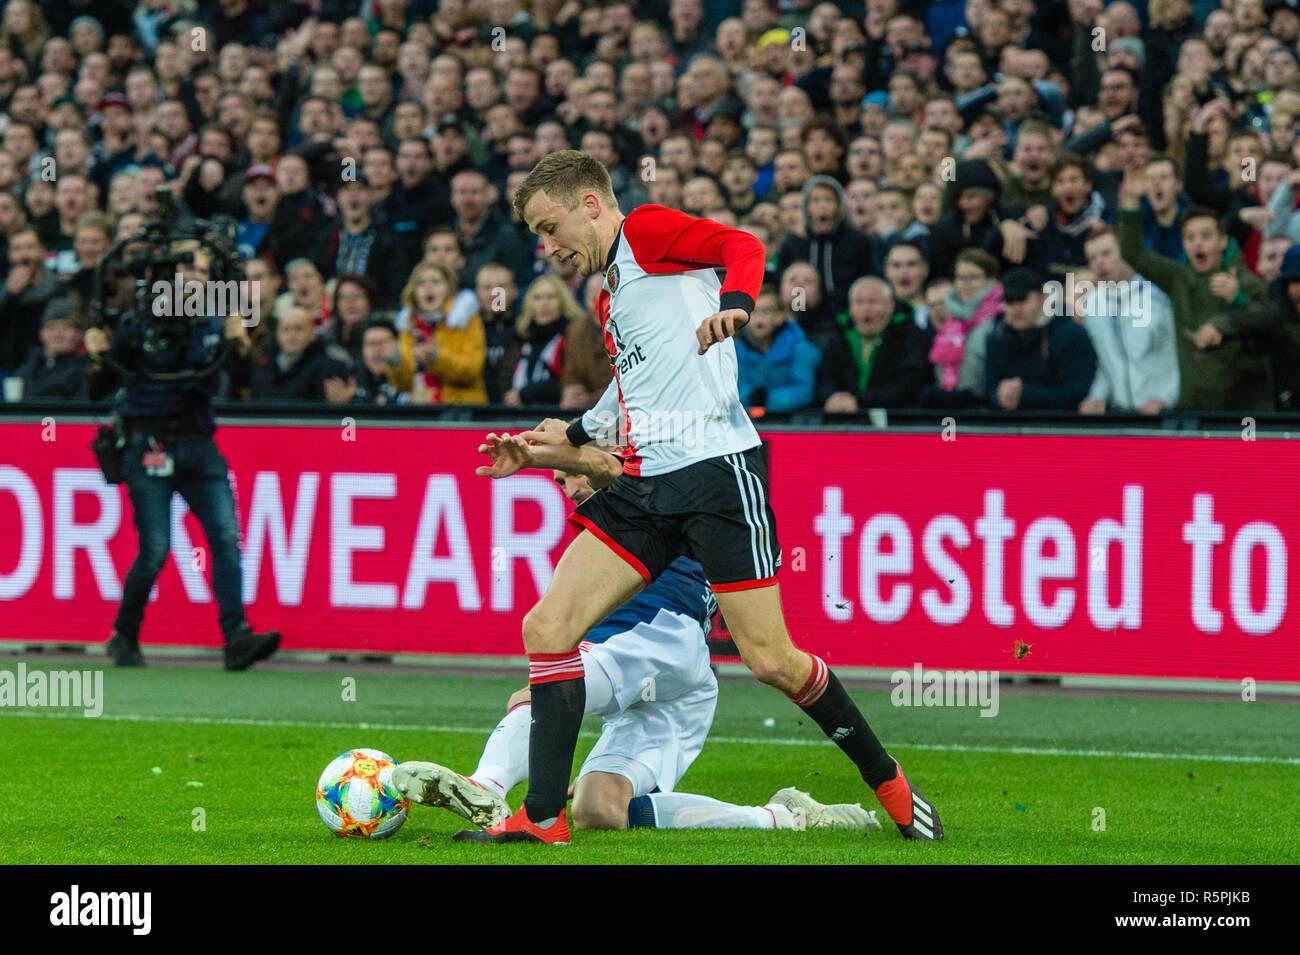 https www alamy com rotterdam netherlands 2 december 2018 soccer dutch eredivisie feyenoord v psv eindhoven l r credit orange pictures vofalamy live news image227305663 html